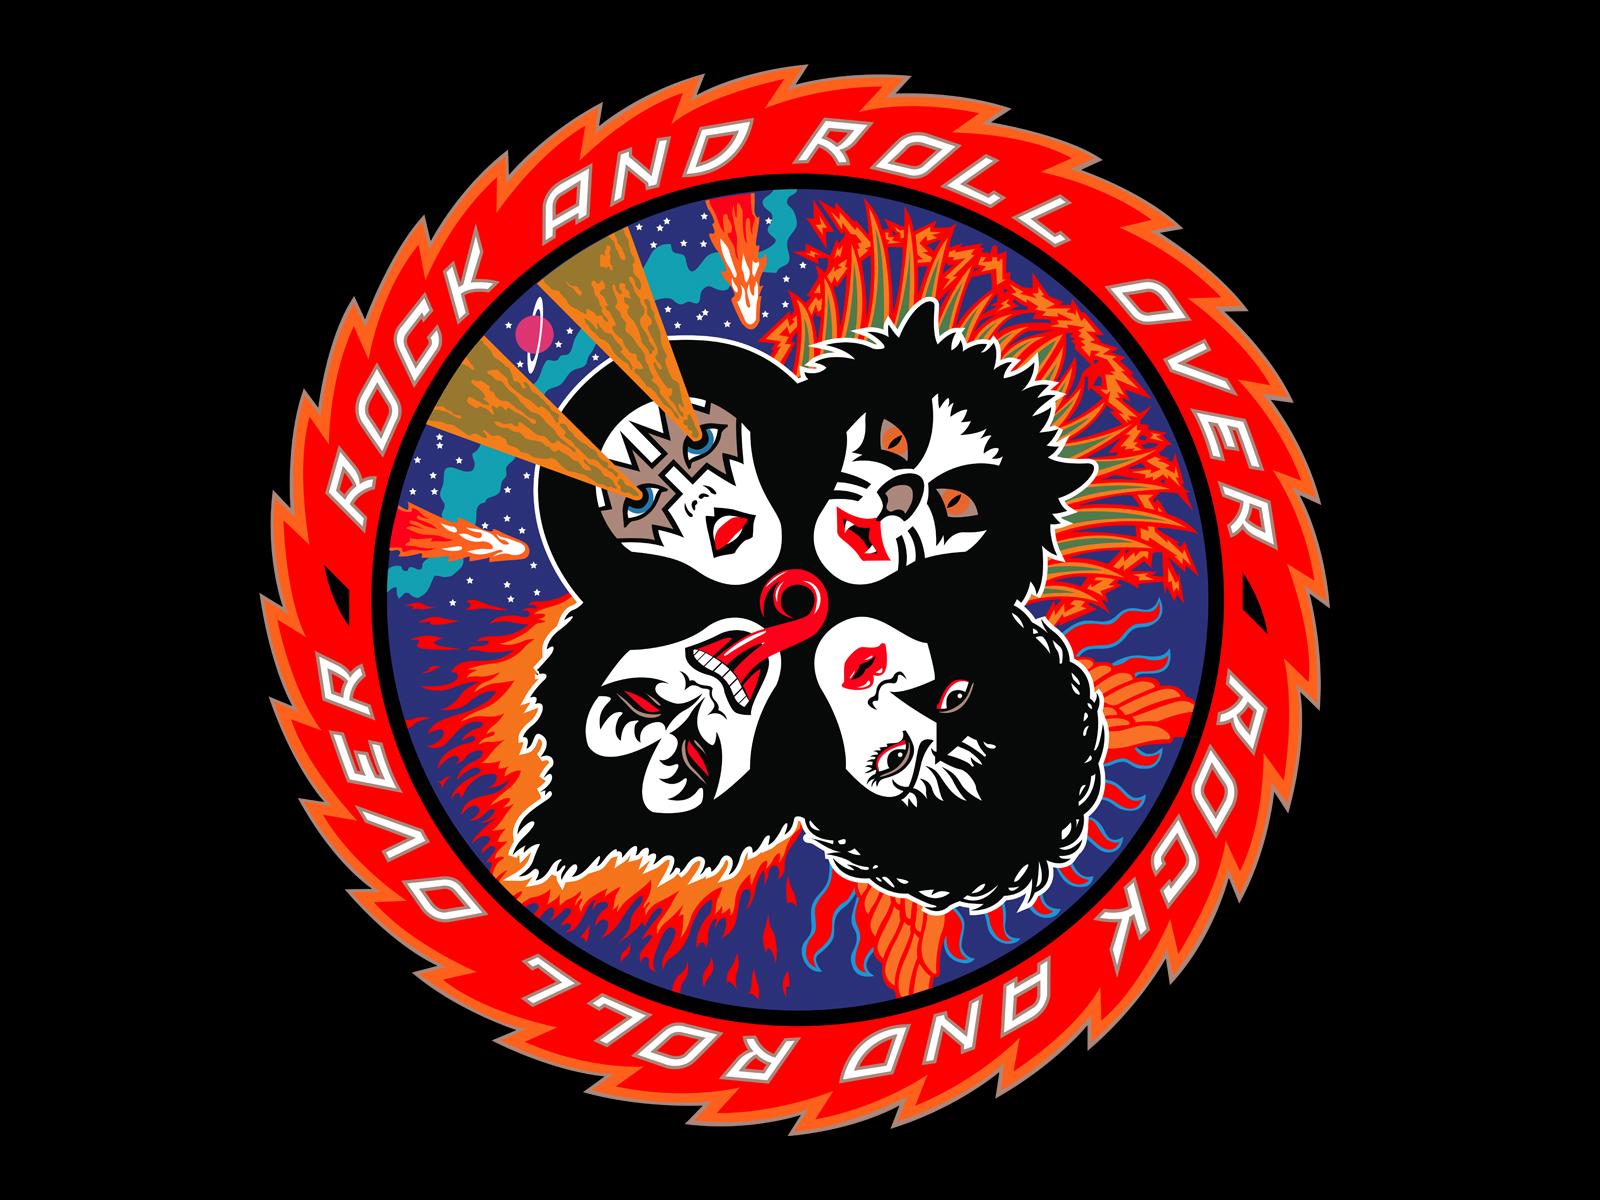 Rock N Roll All Night by Wolverine080976 1600x1200